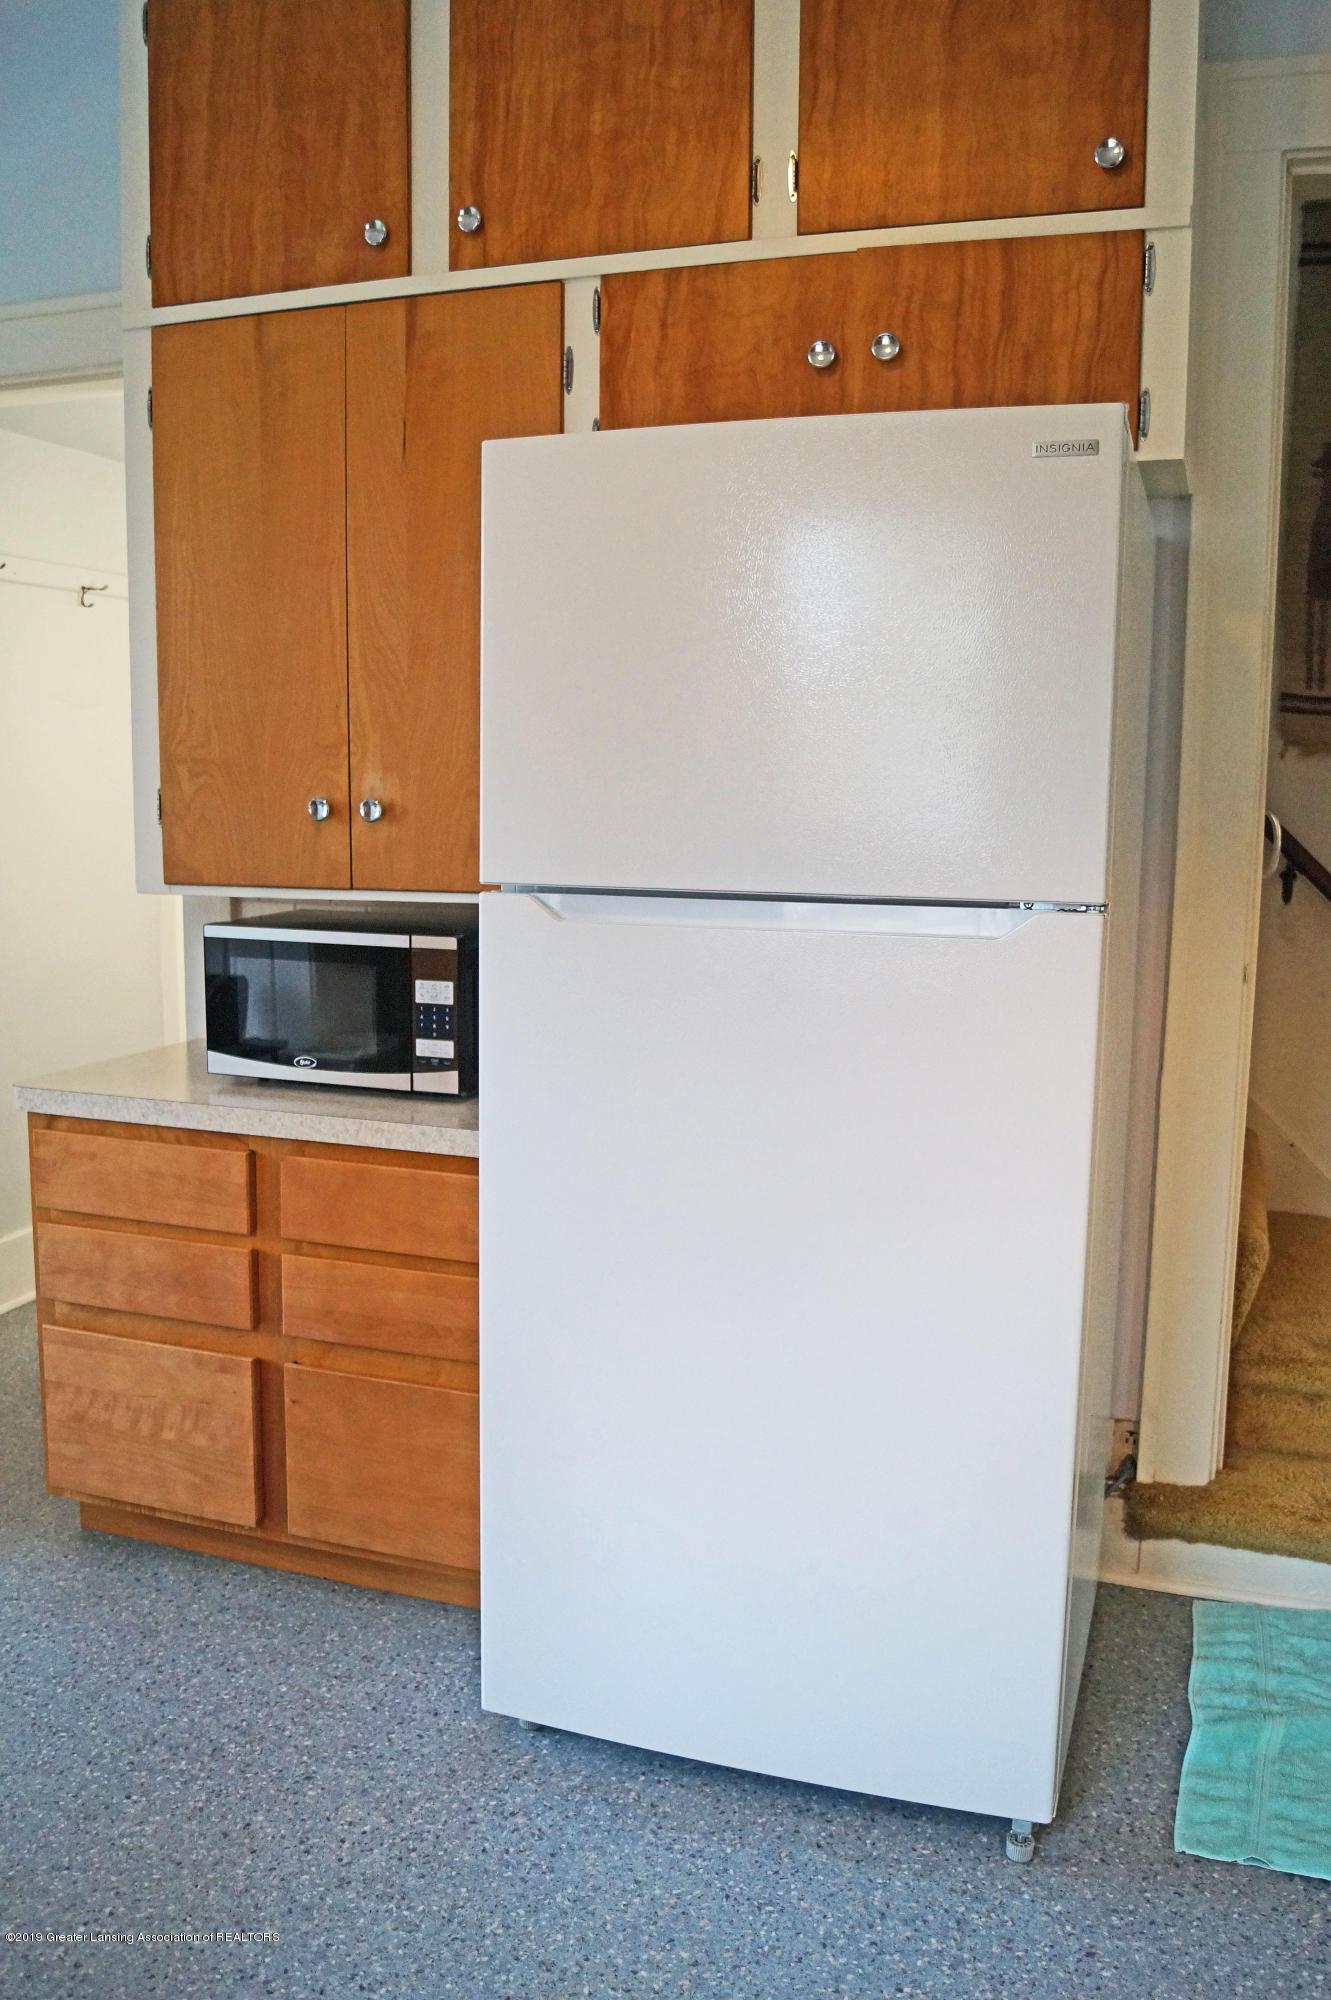 243 Kensington Rd - Kitchen - 14